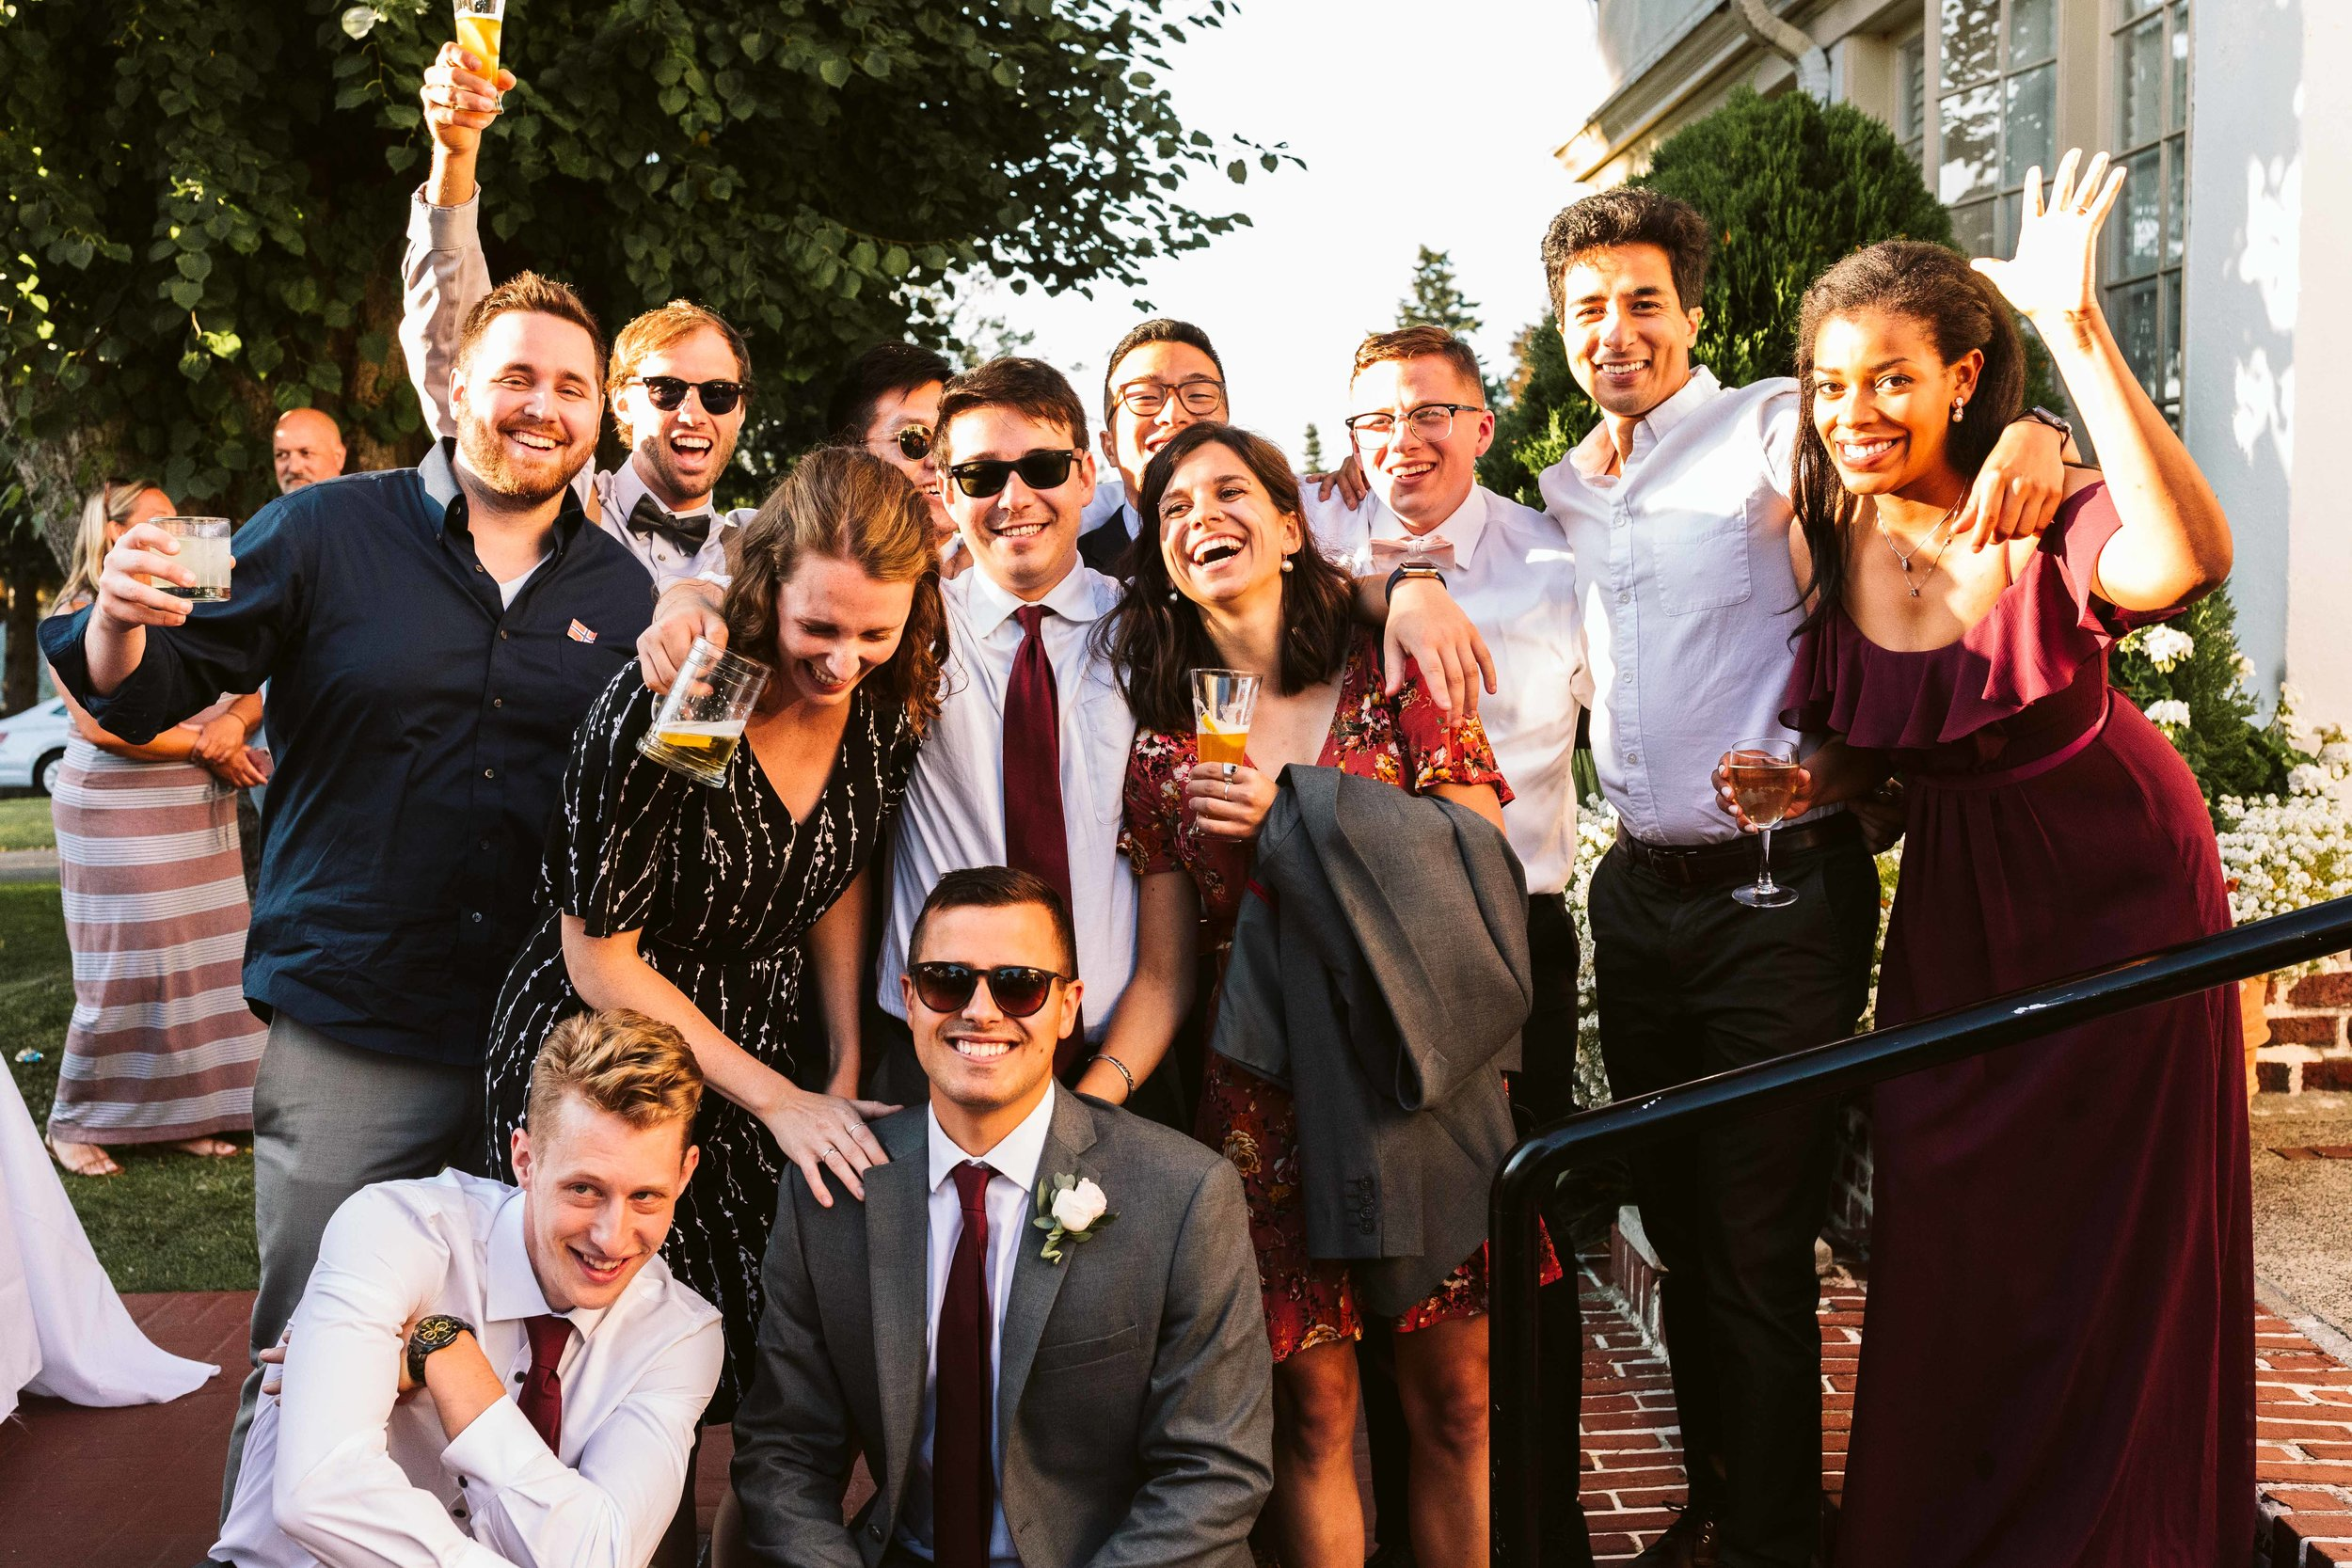 lairmont-manor-wedding-102.jpg